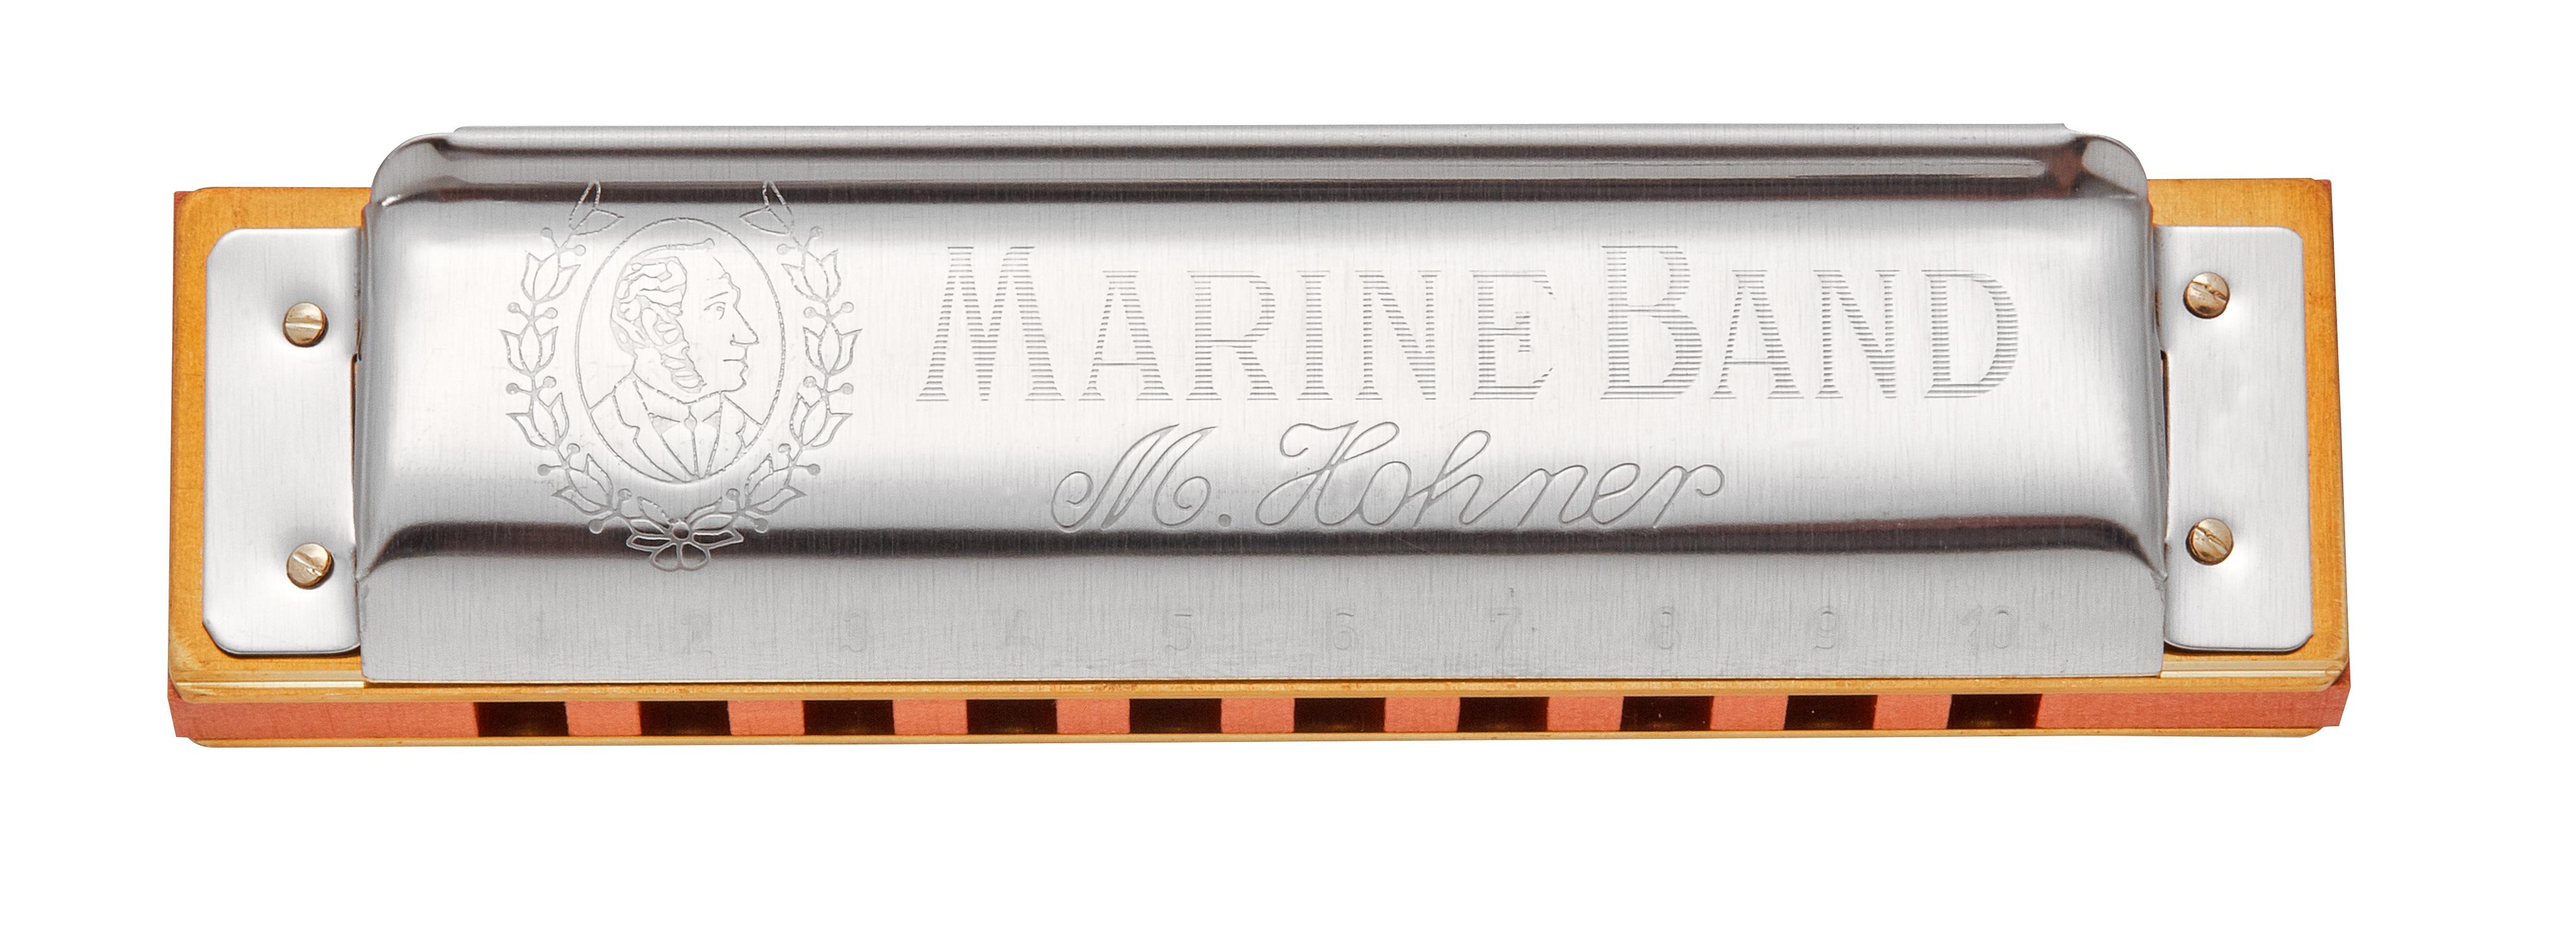 Hohner Marine Band 1896 Ab-major